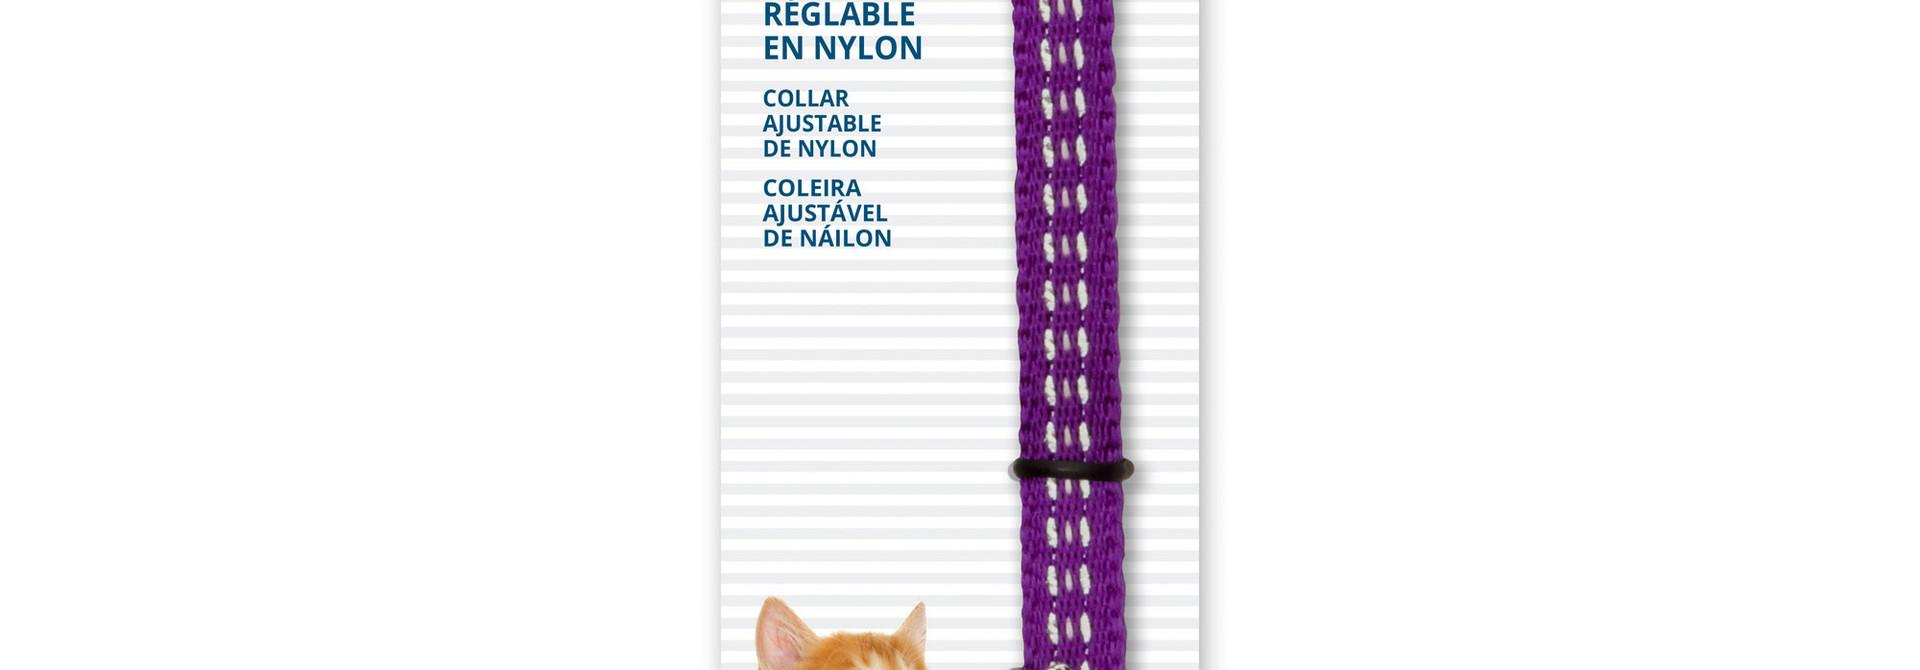 CatIt Ajustable Nylon Collar-Reflective 20-30cm-Purple